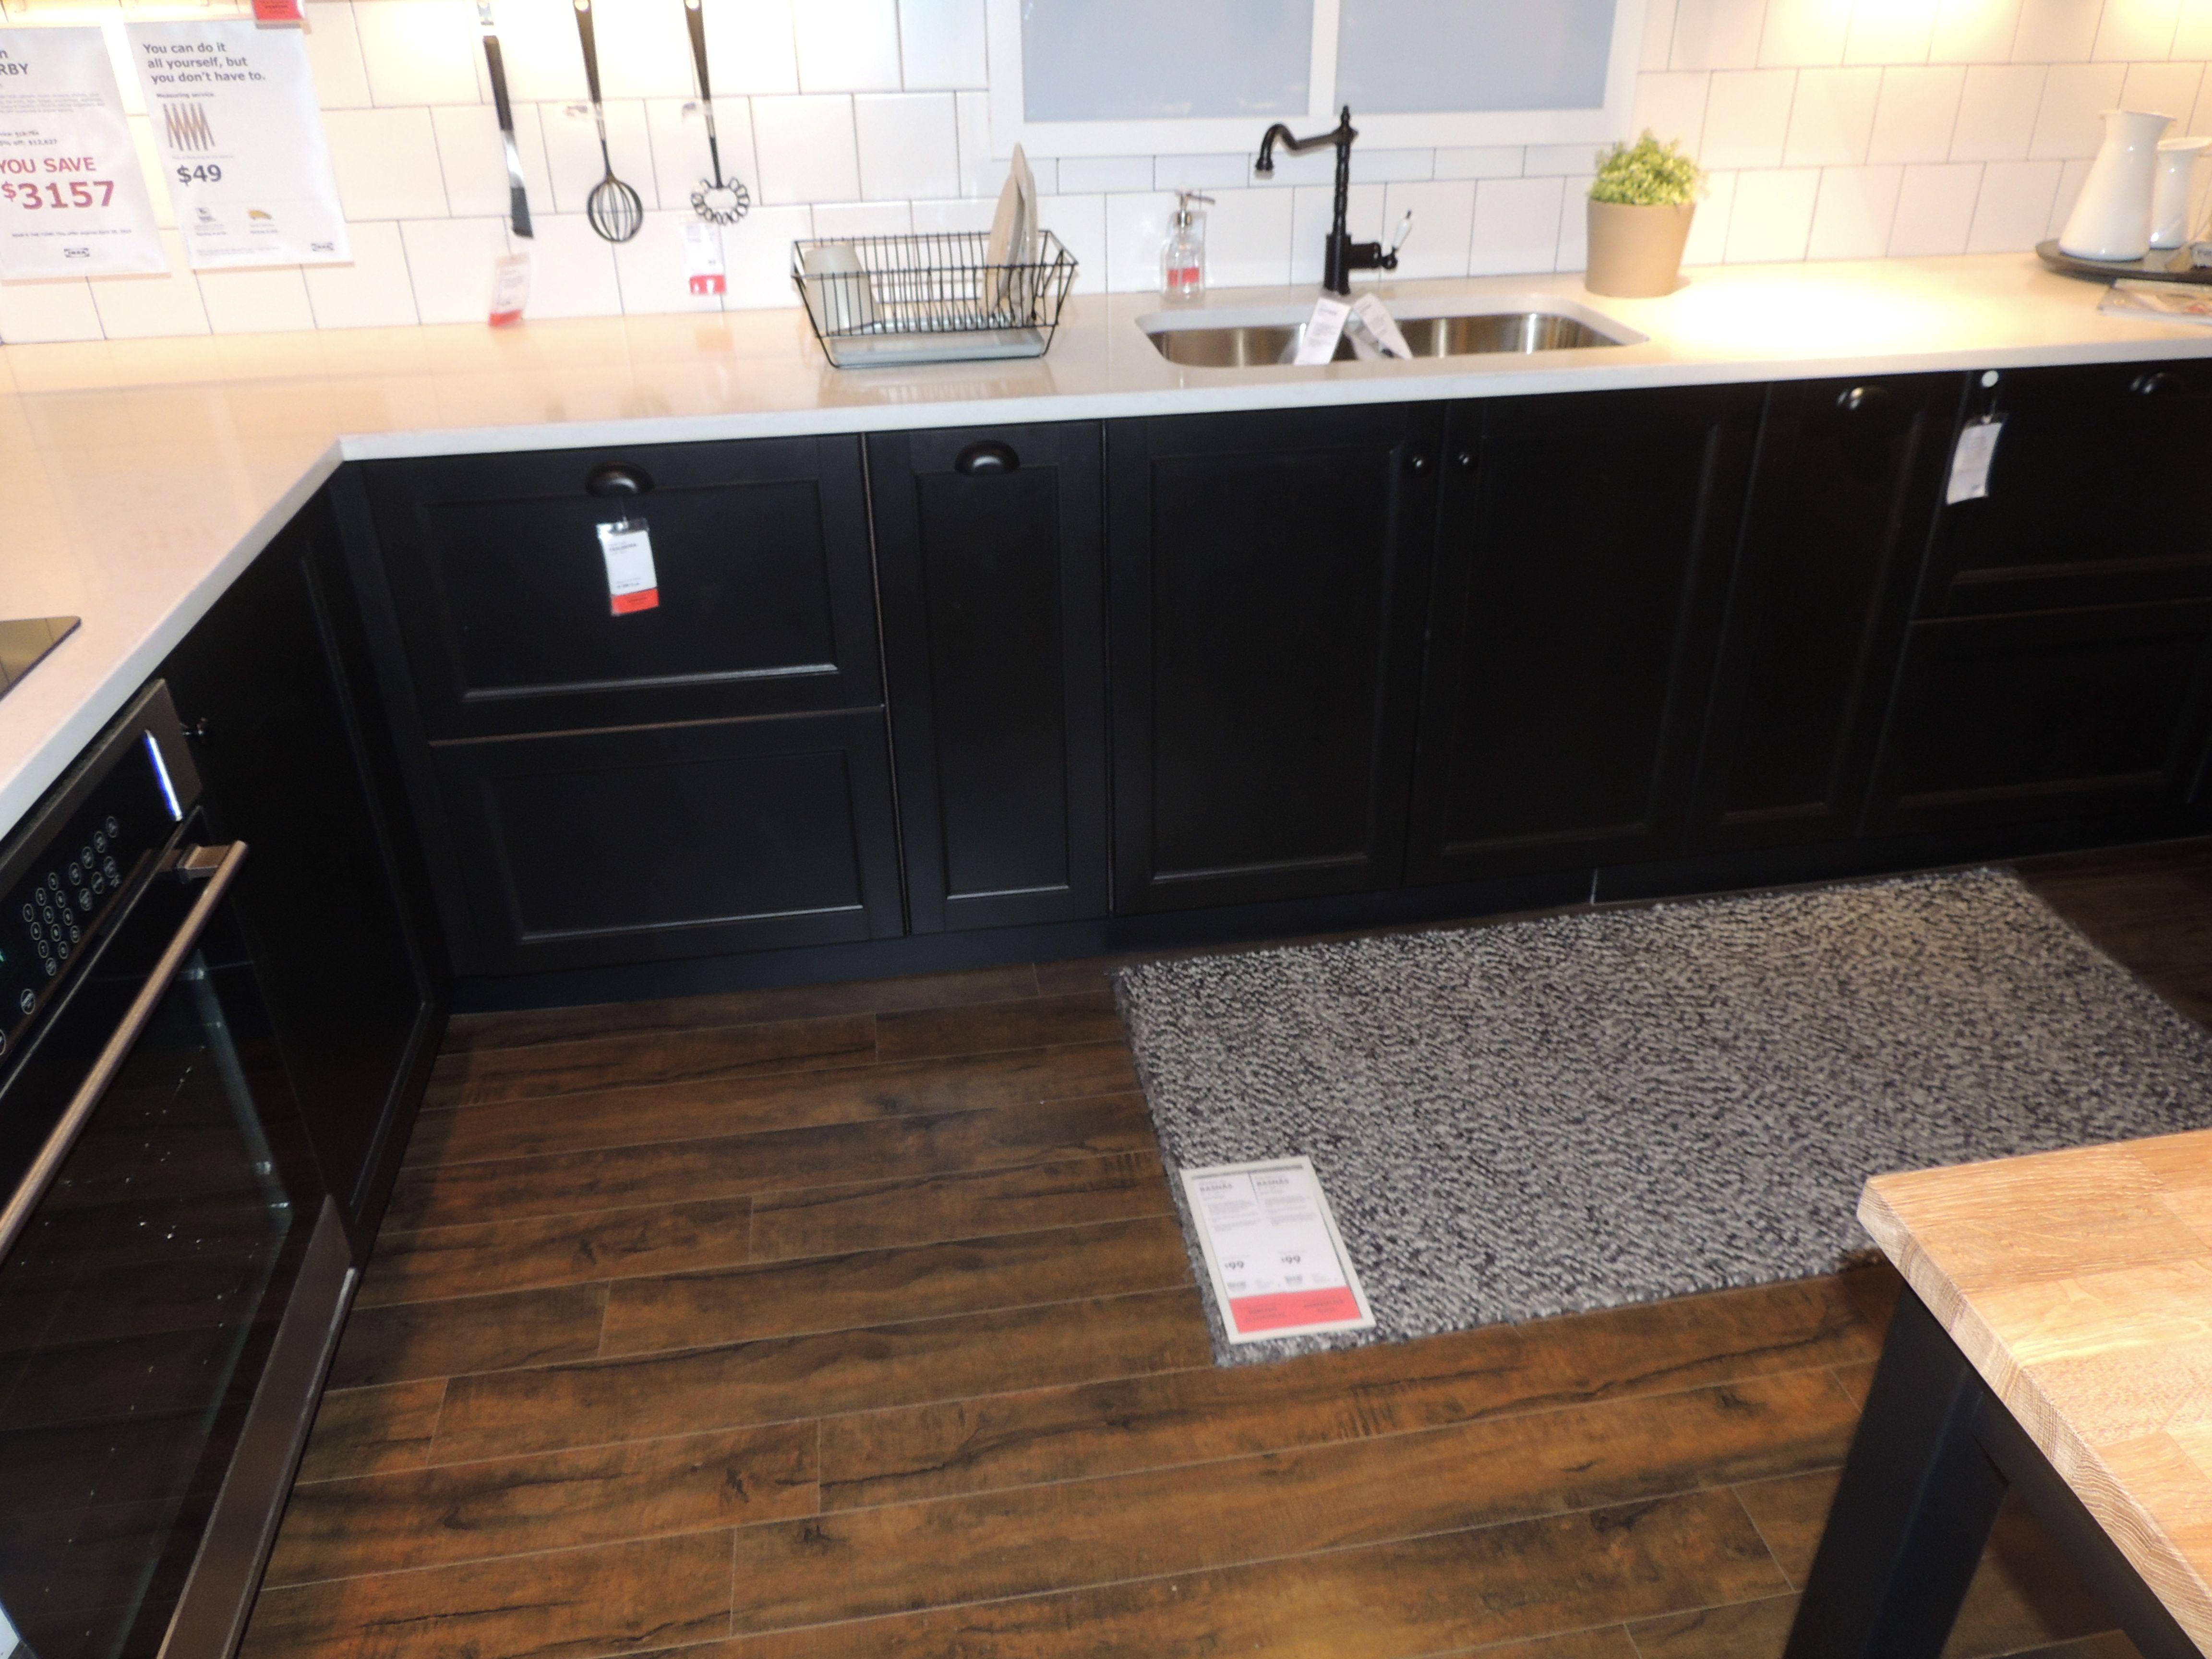 laxarby door google search ground floor kitchen pinterest doors countertop and kitchens. Black Bedroom Furniture Sets. Home Design Ideas